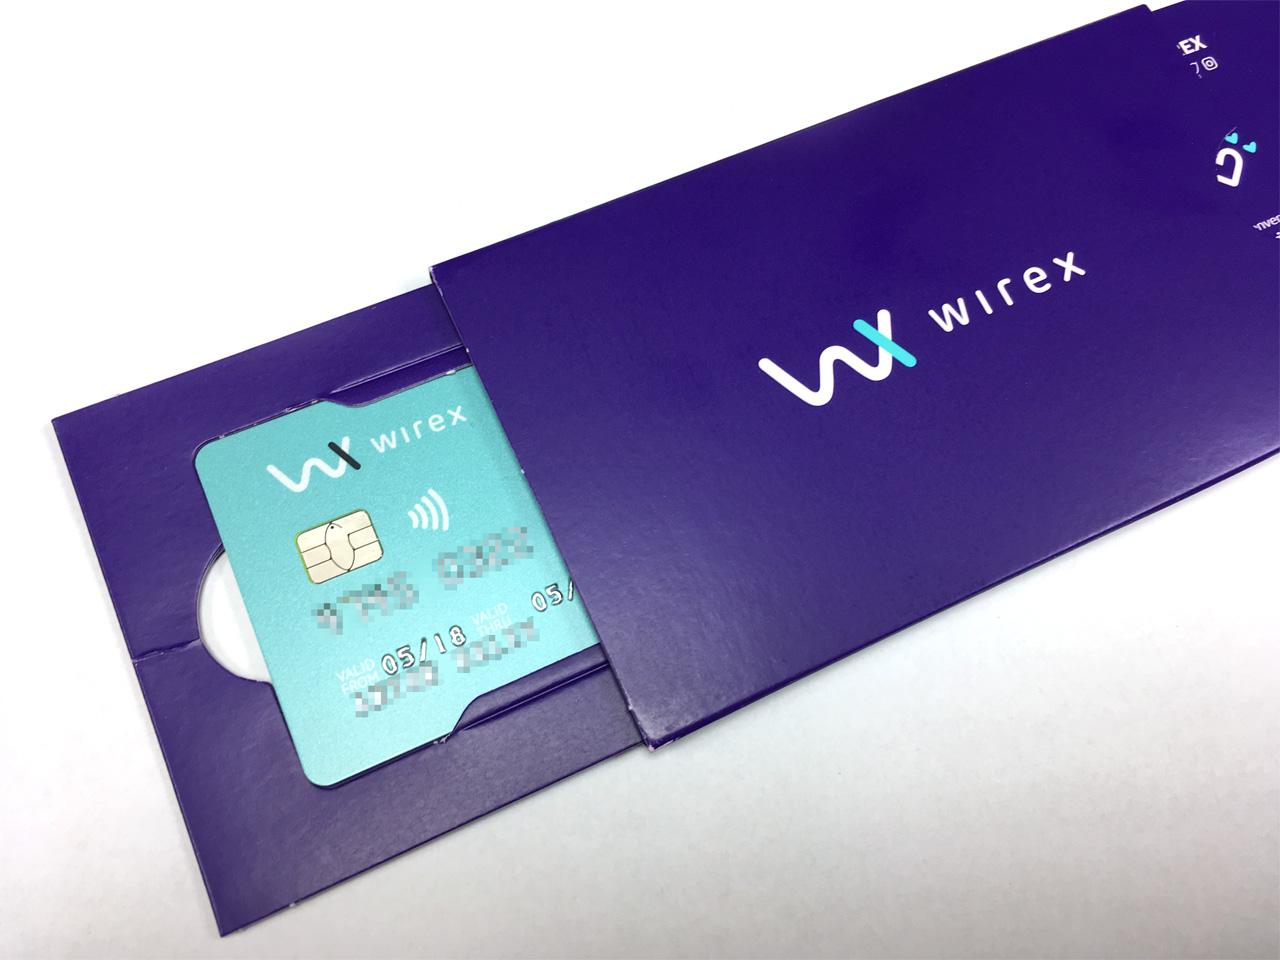 Wirex debit card